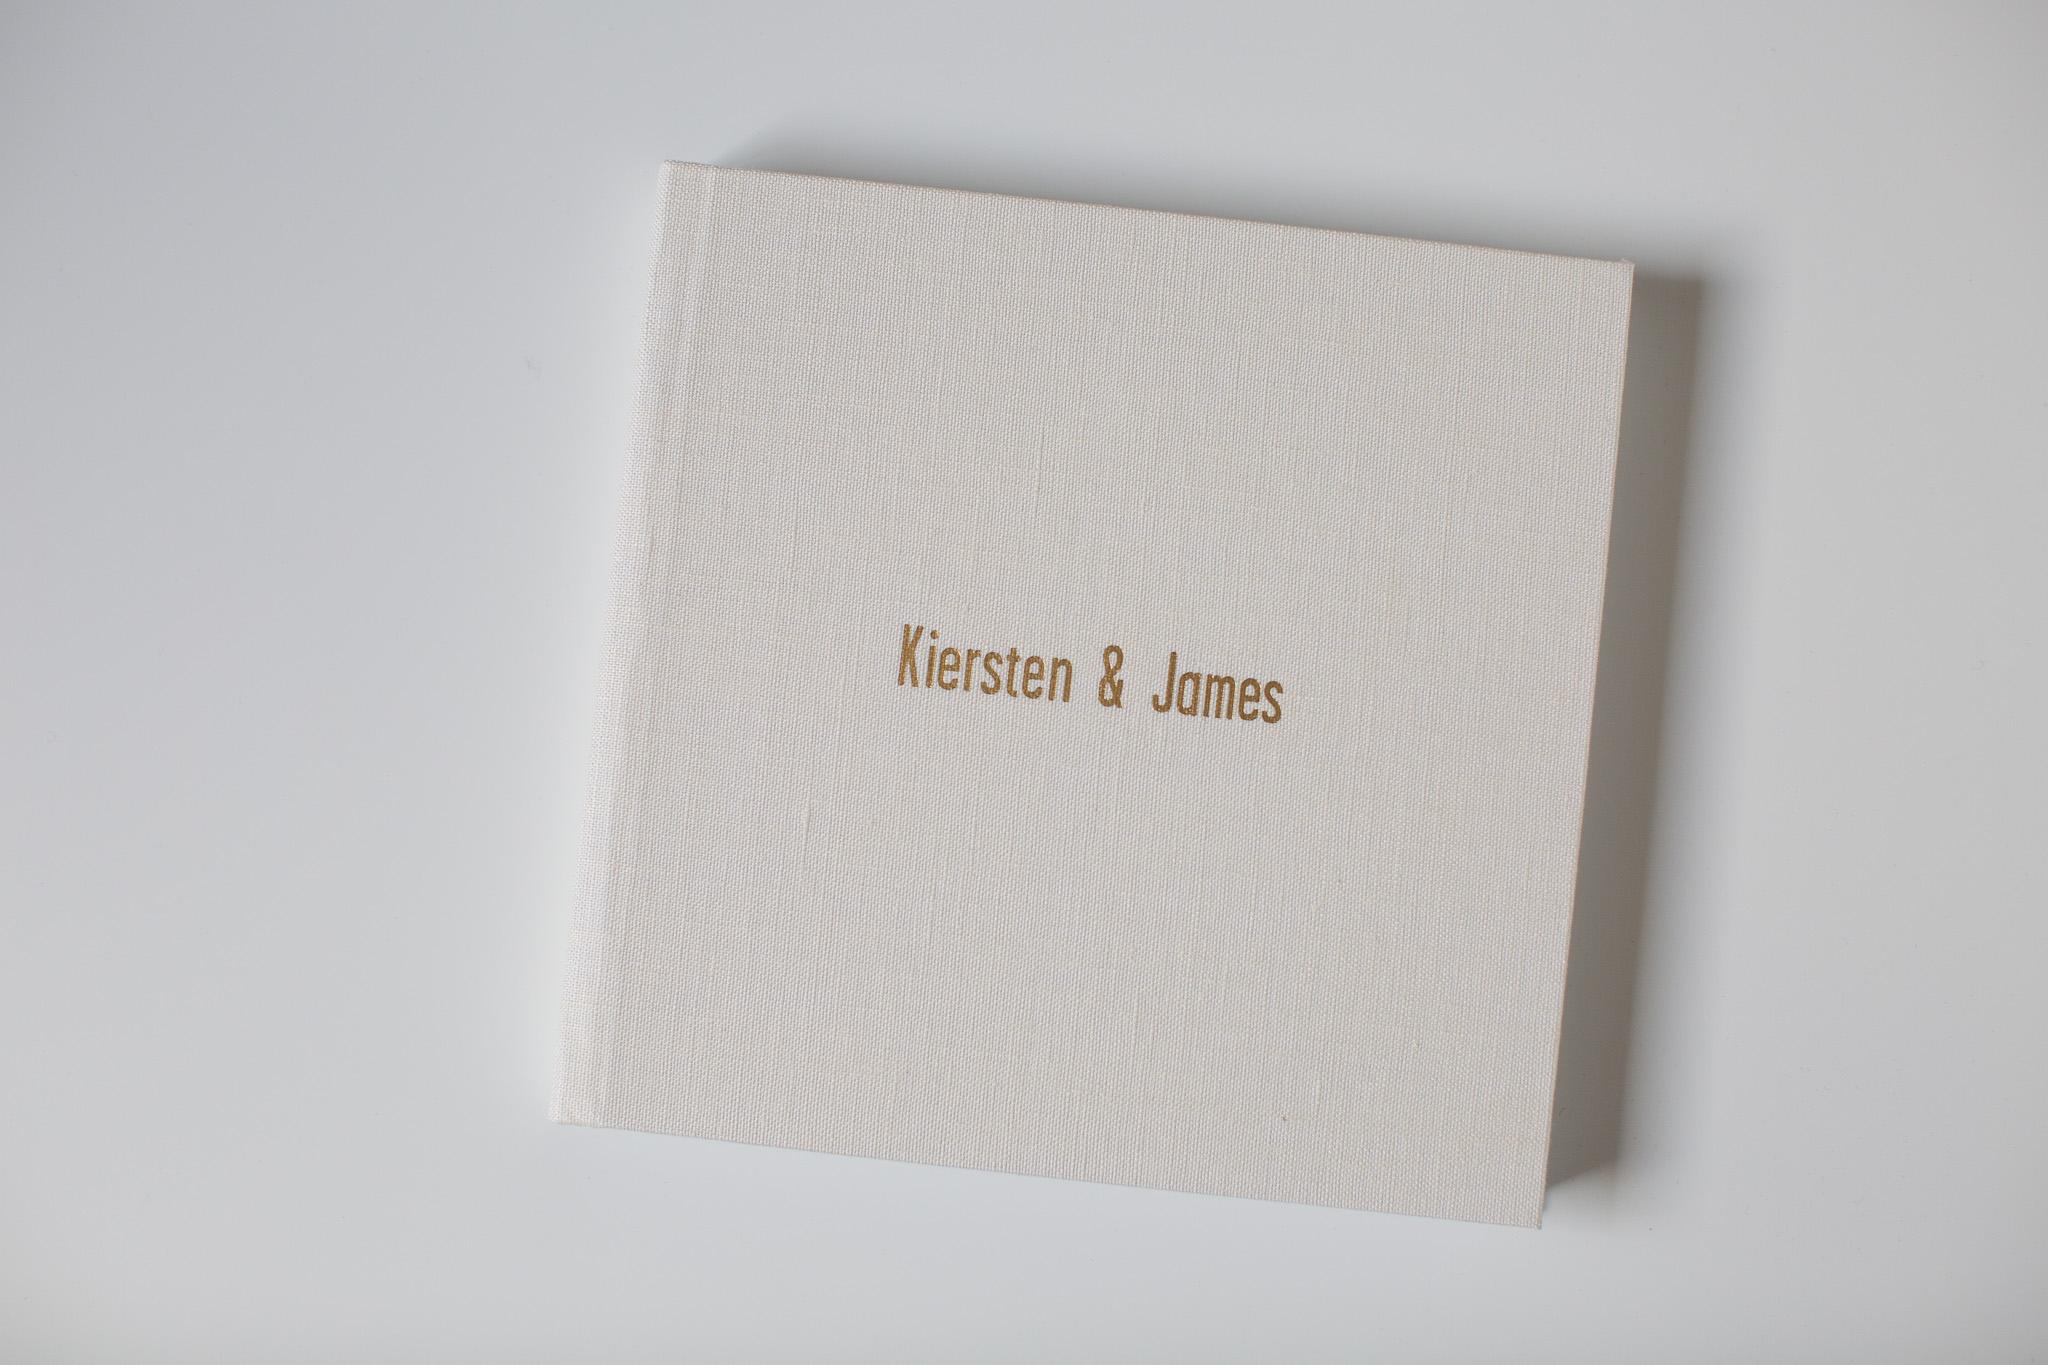 albumsbooks_JTP2019_001.jpg